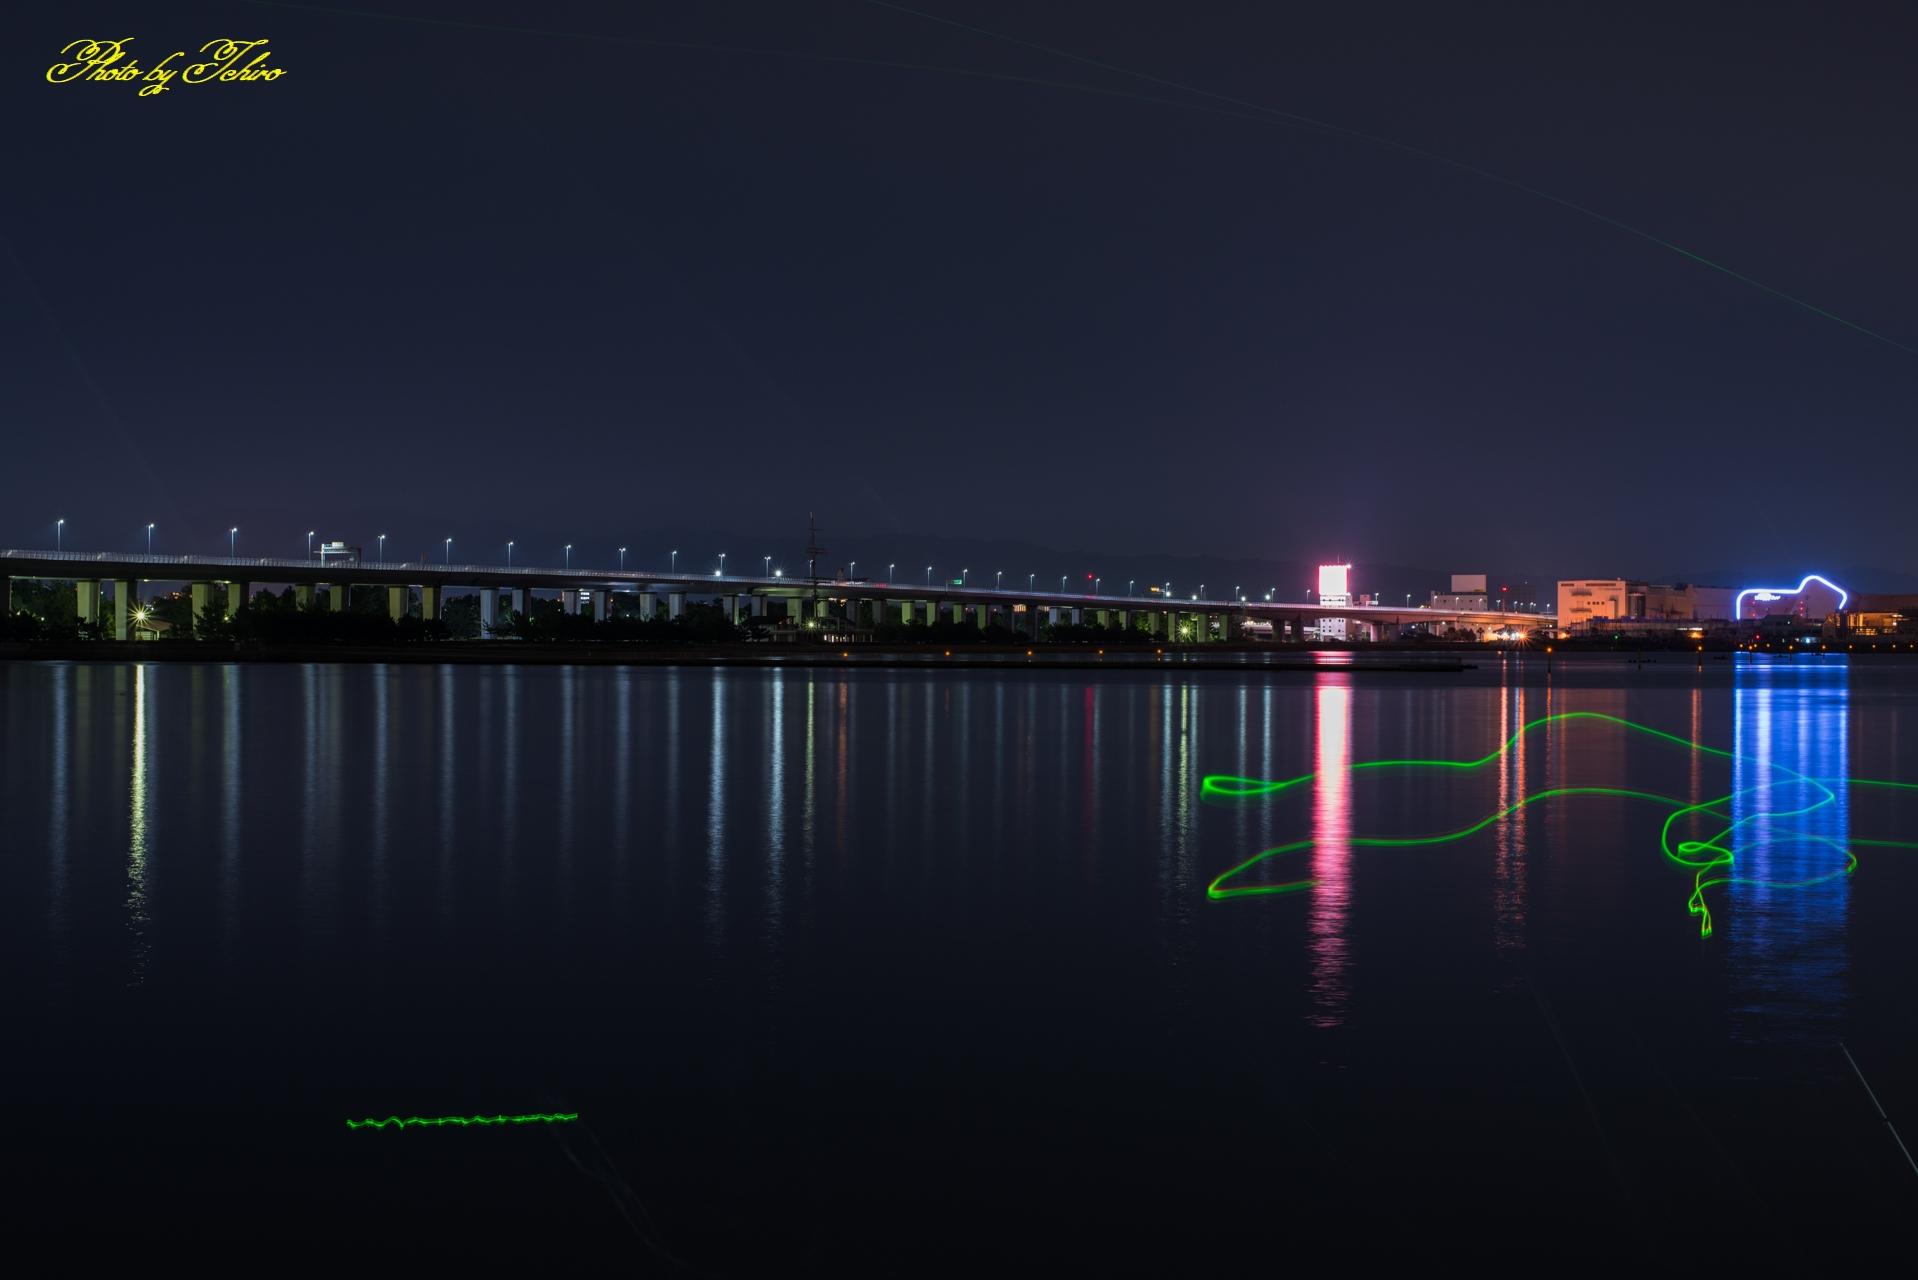 夜の貝塚港